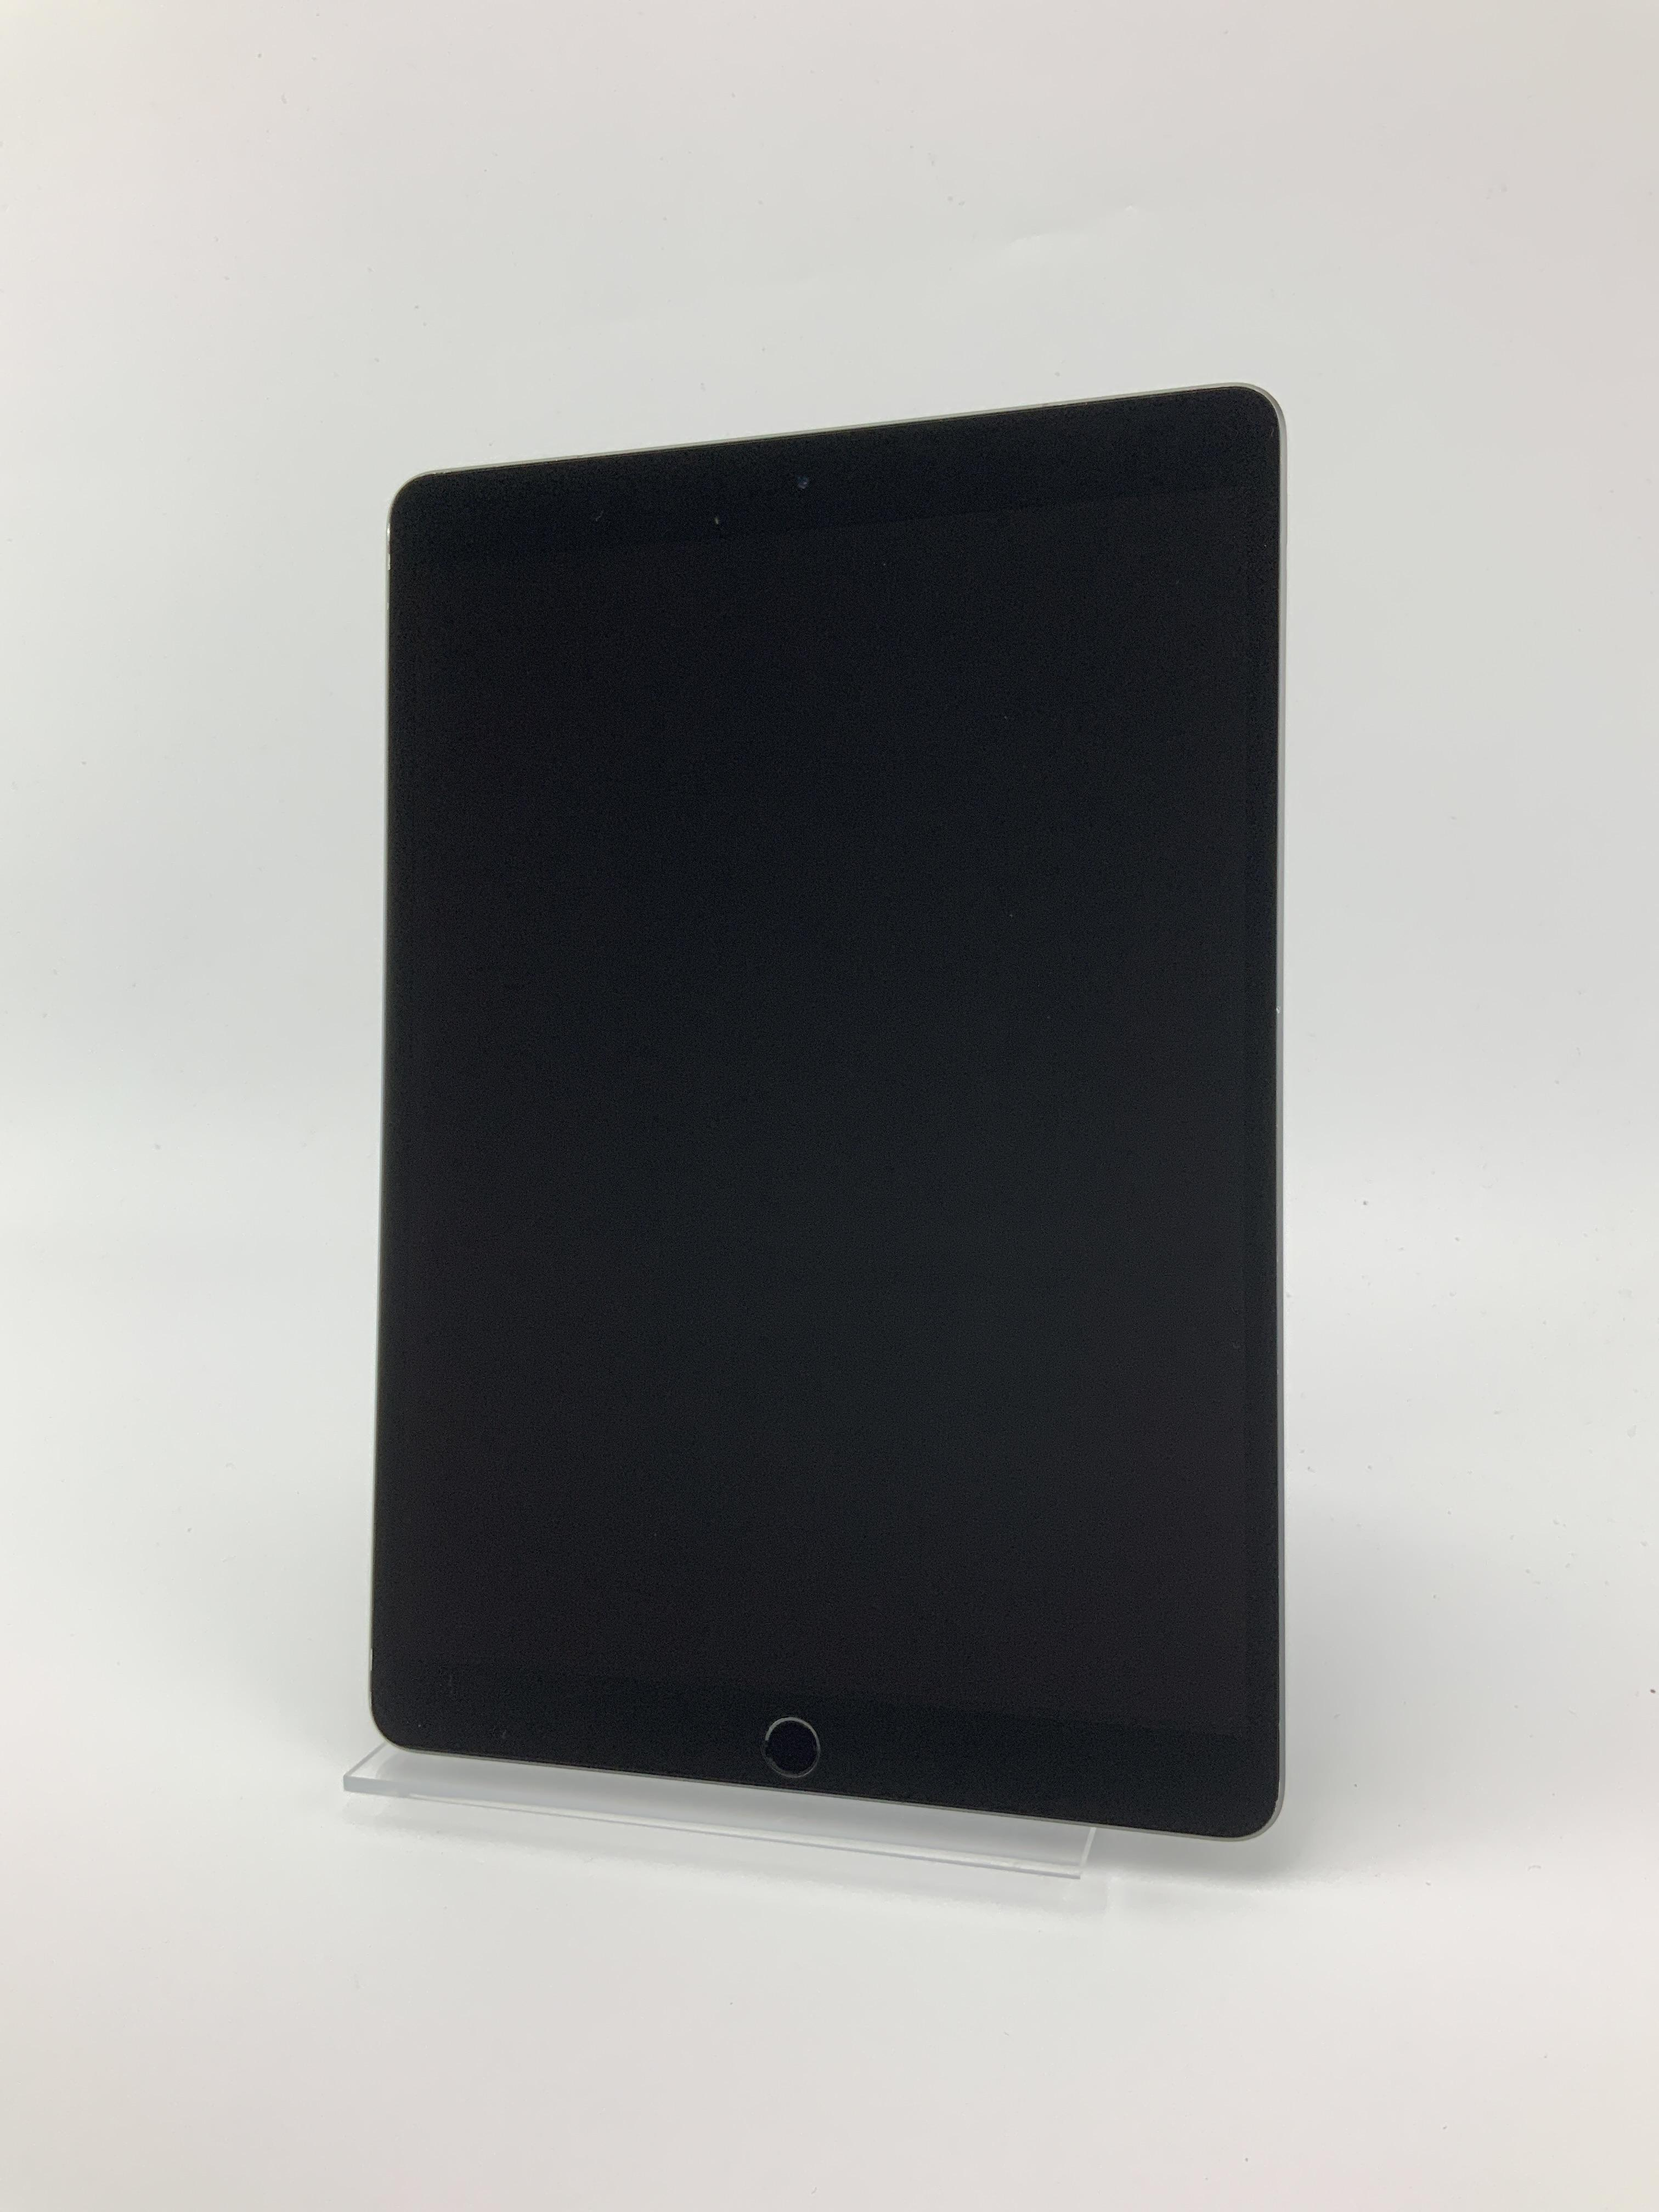 iPad Air 3 Wi-Fi + Cellular 256GB, 256GB, Space Gray, bild 1